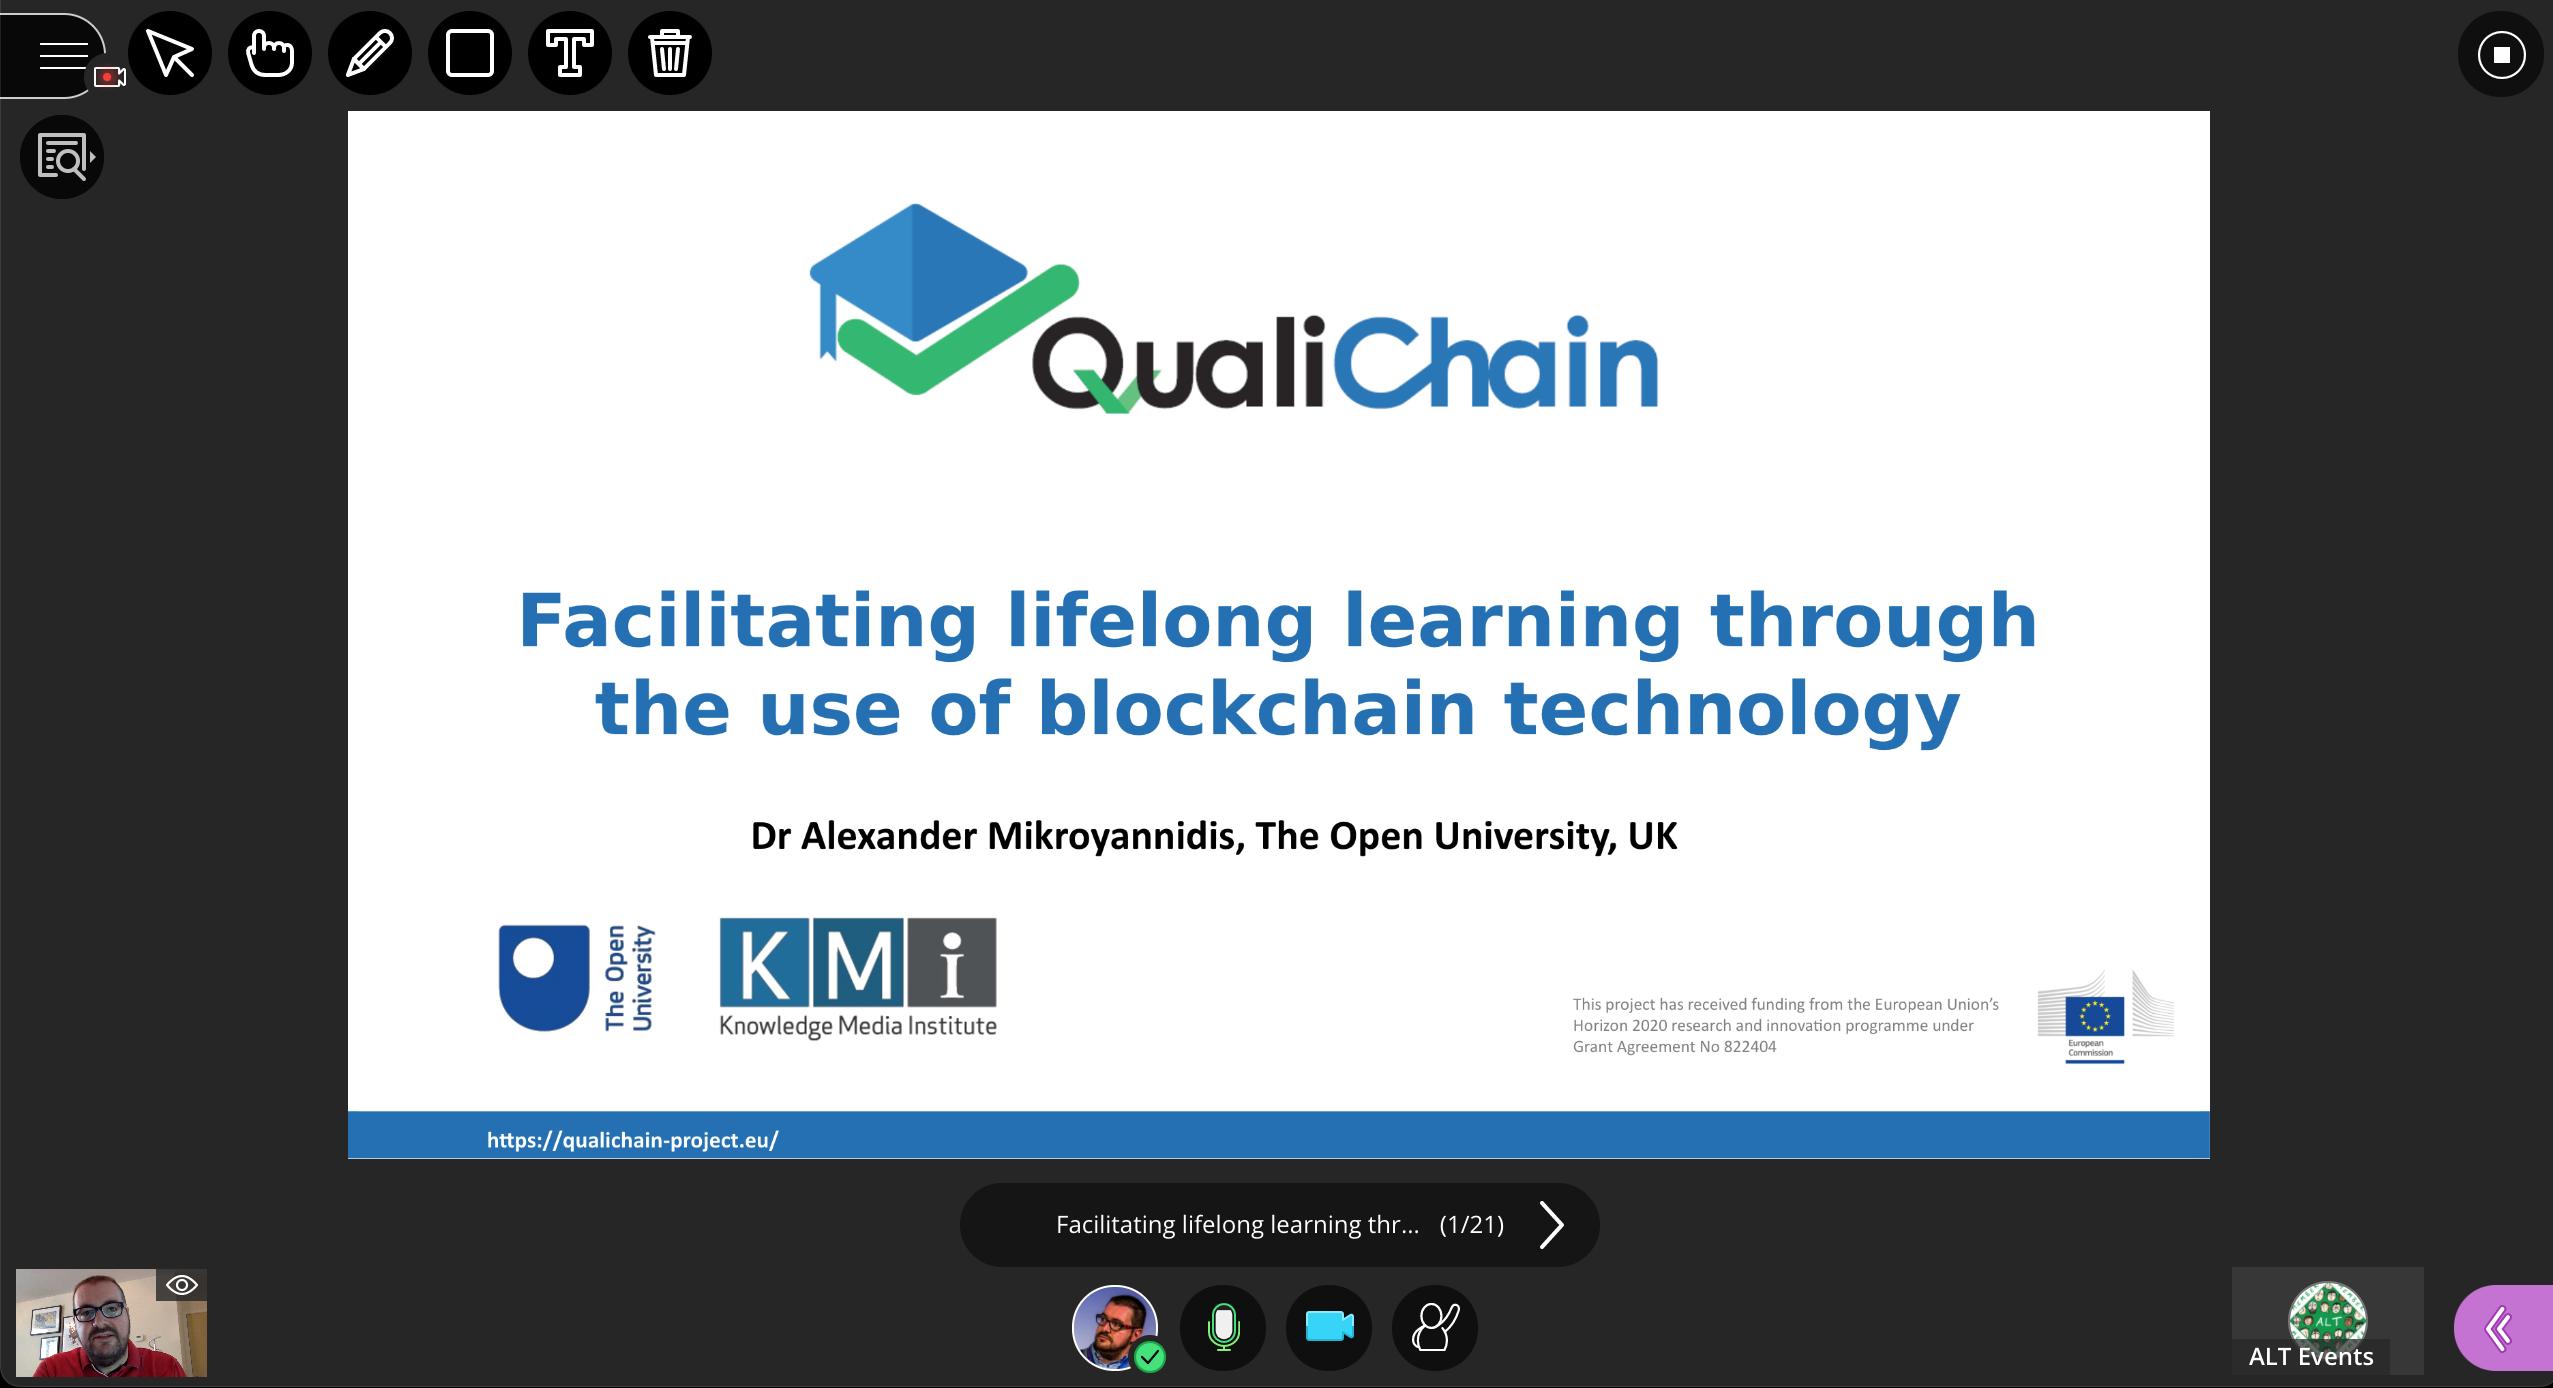 Webinar: Facilitating lifelong learning through the use of blockchain technology